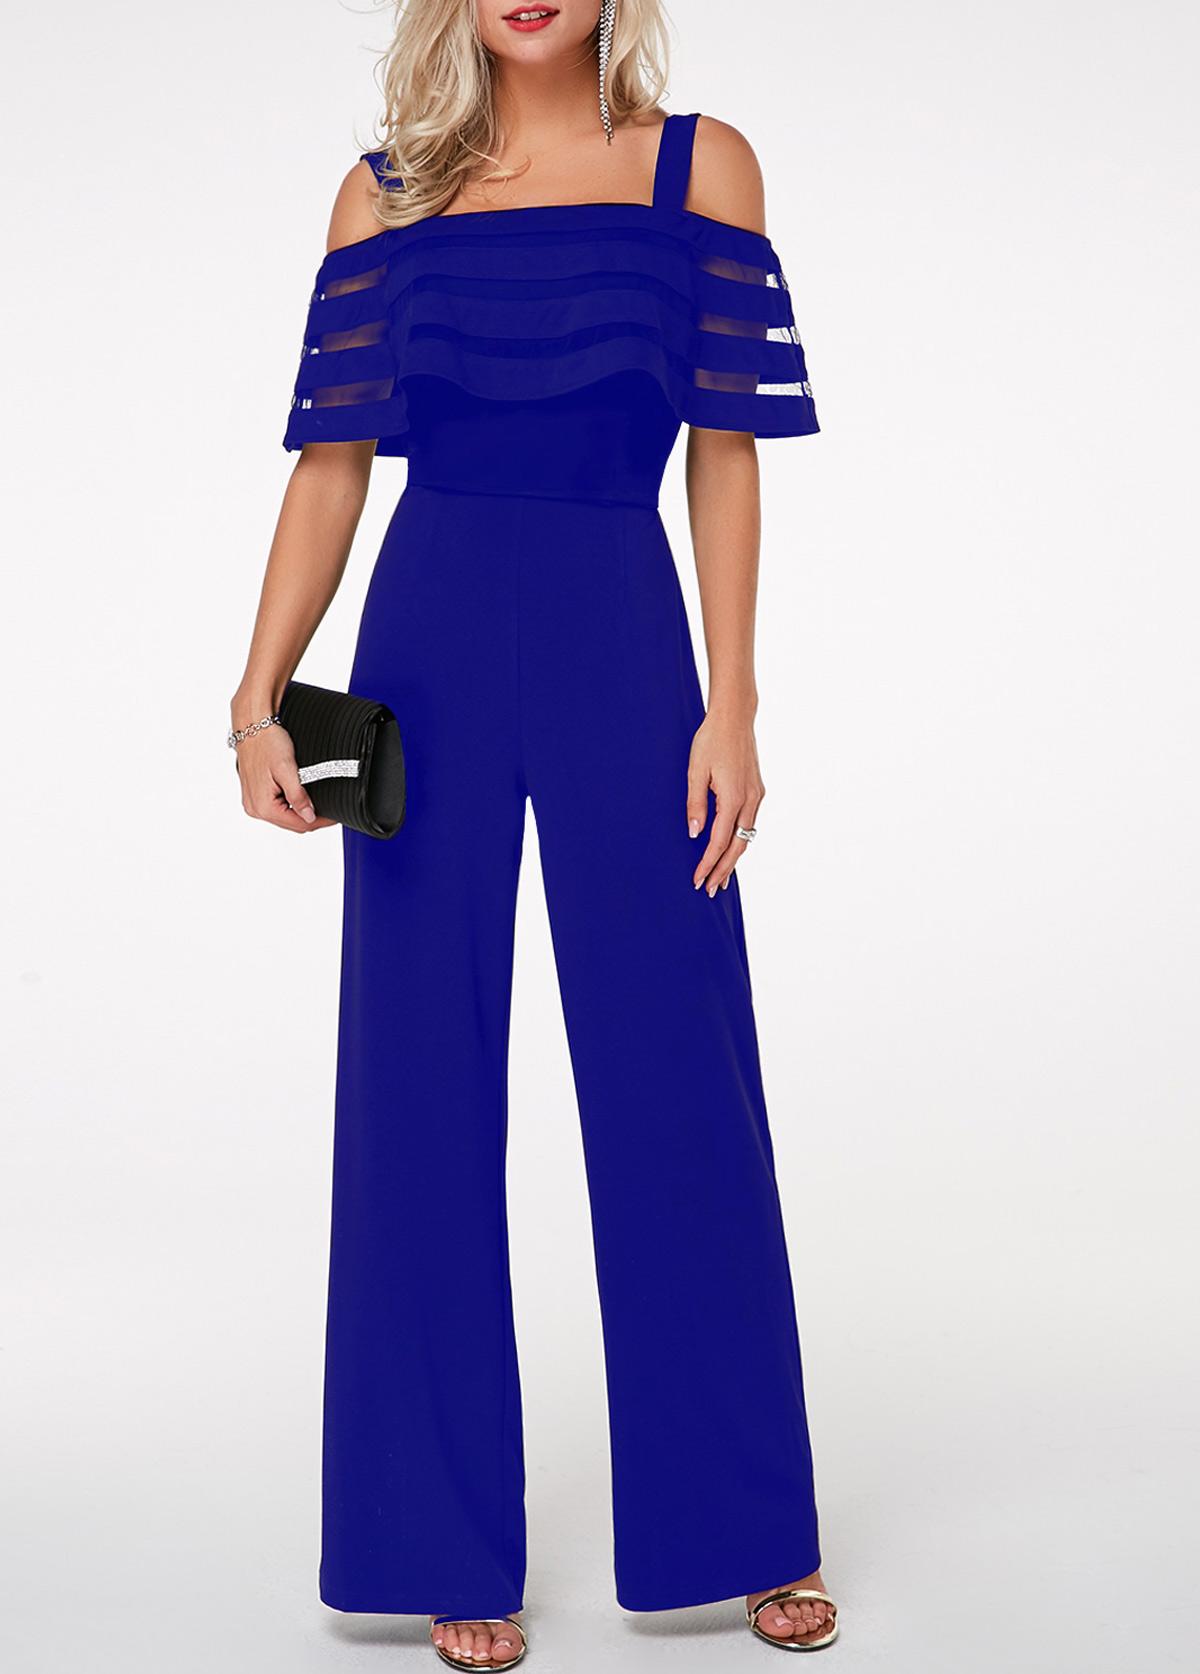 Blue Dressy Plus Jumpsuit: Royal Blue Strappy Cold Shoulder Overlay Jumpsuit